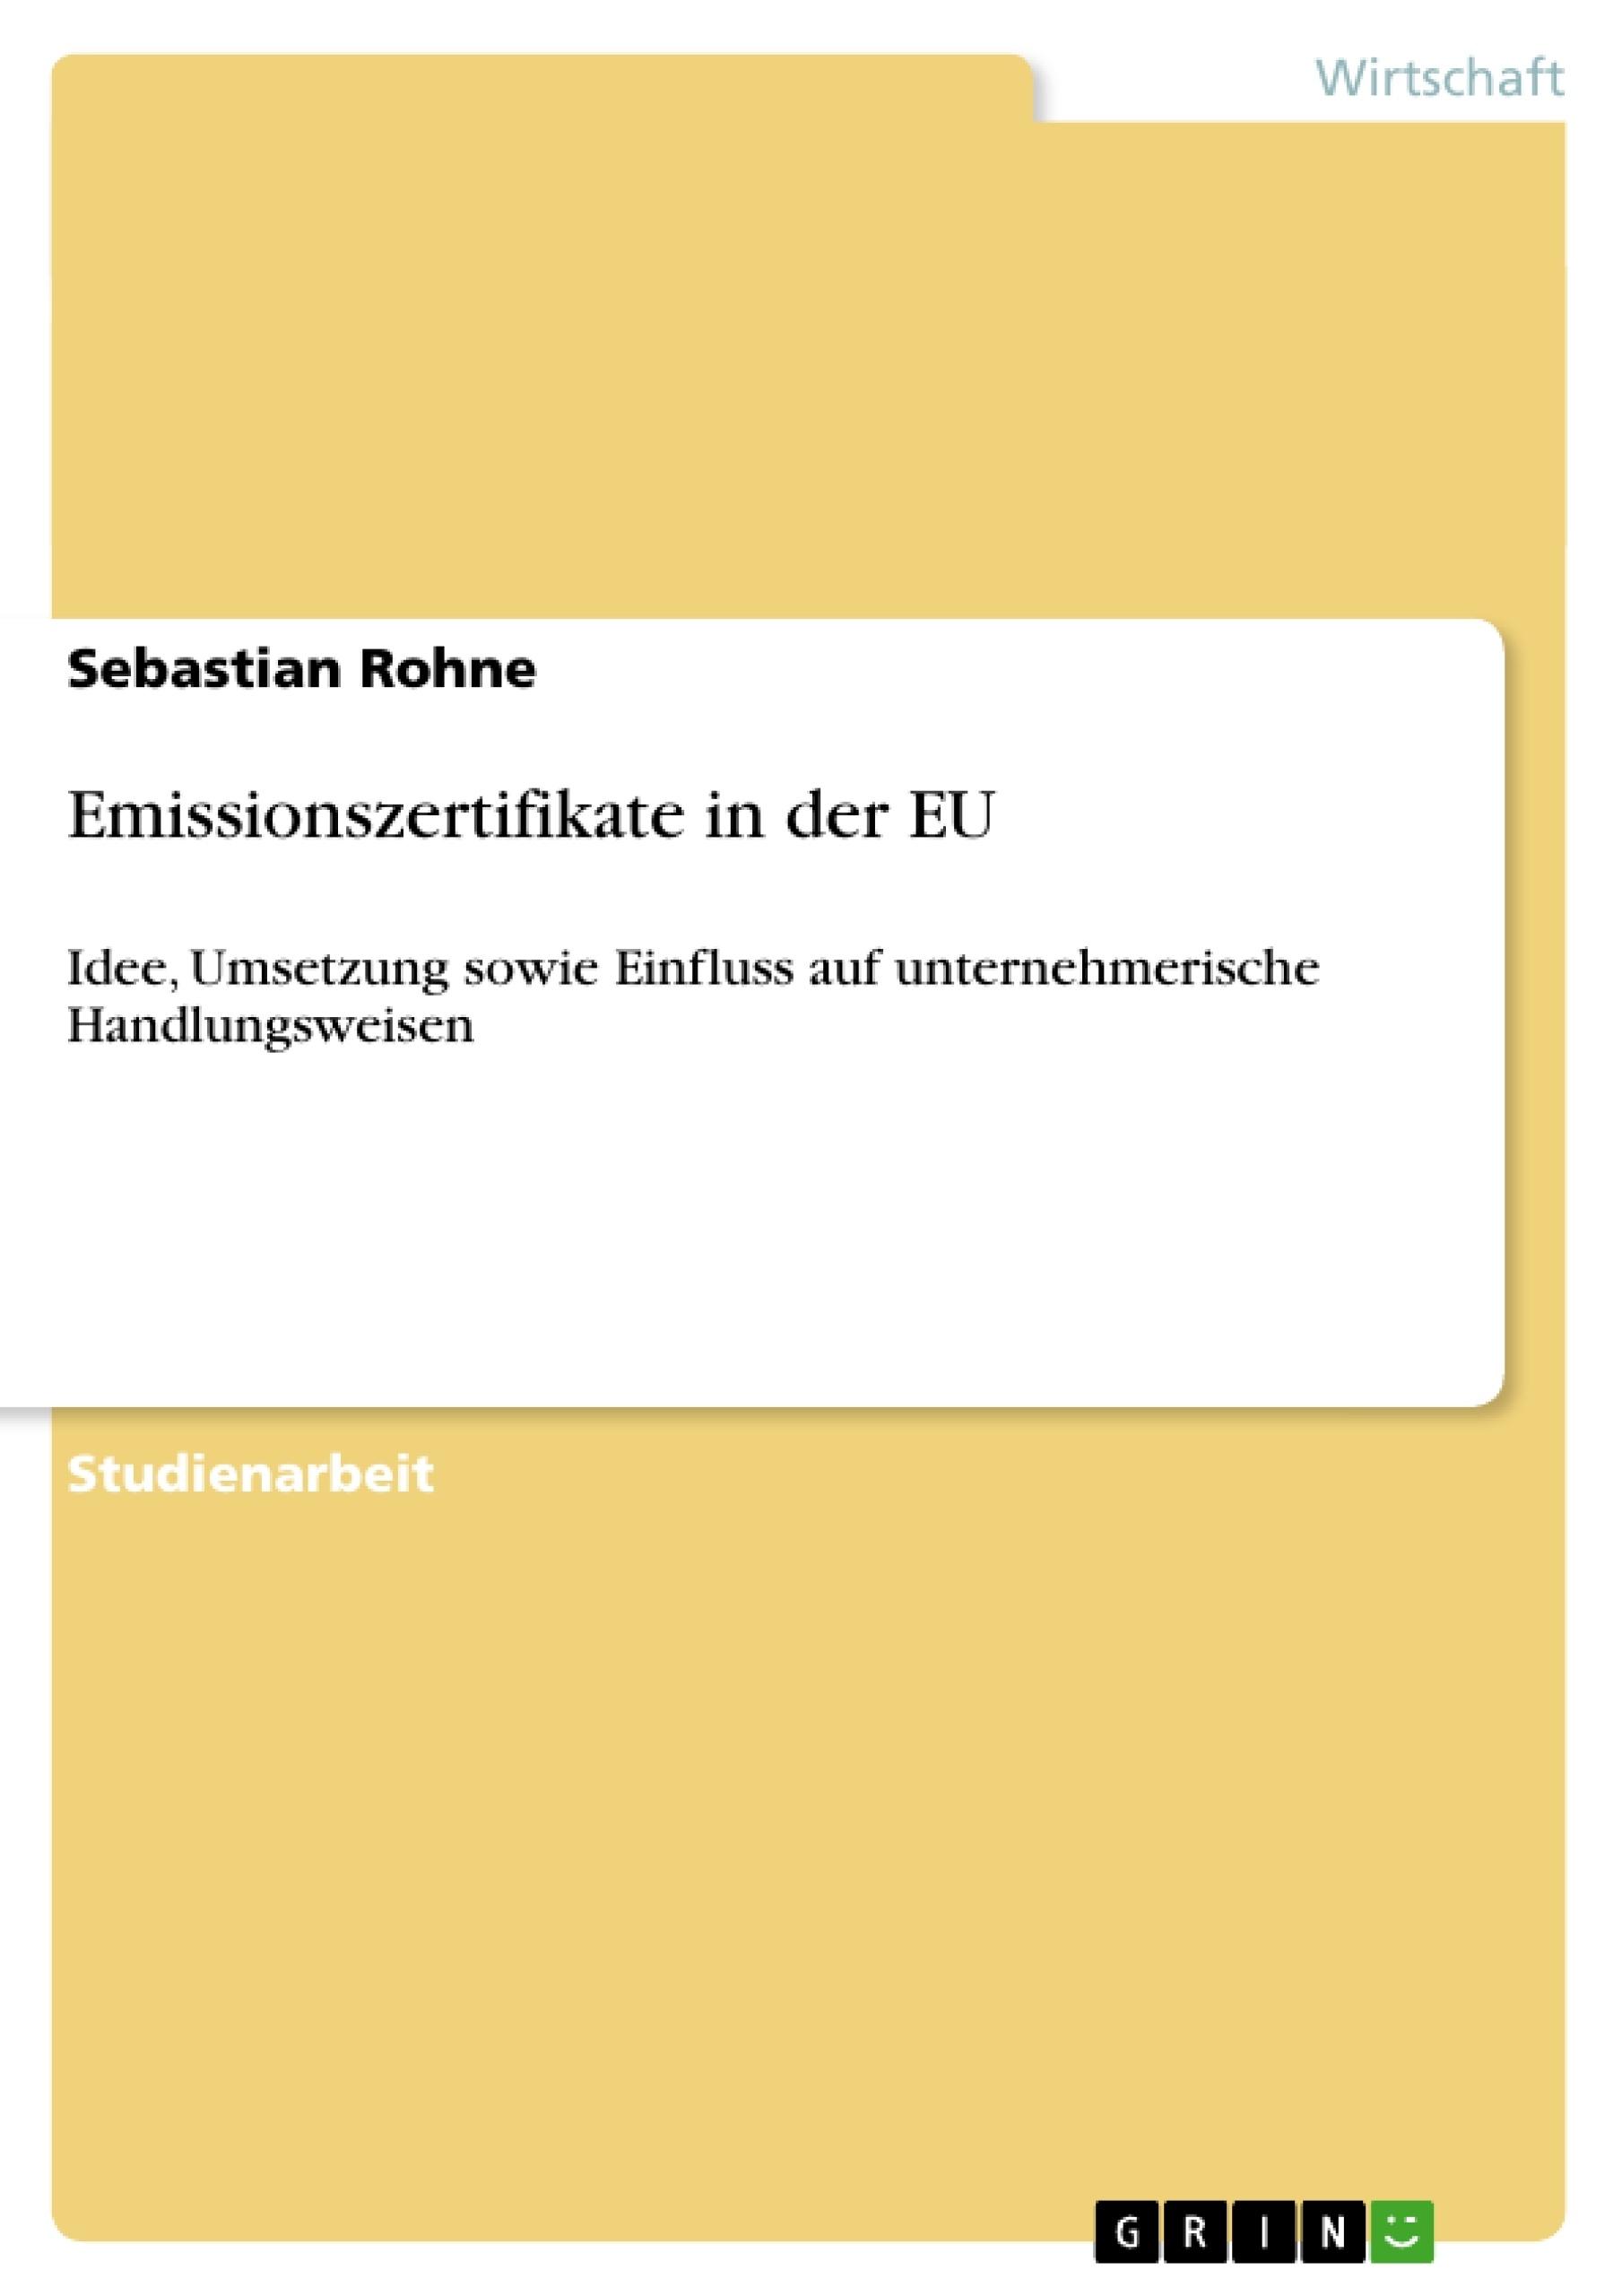 Titel: Emissionszertifikate in der EU